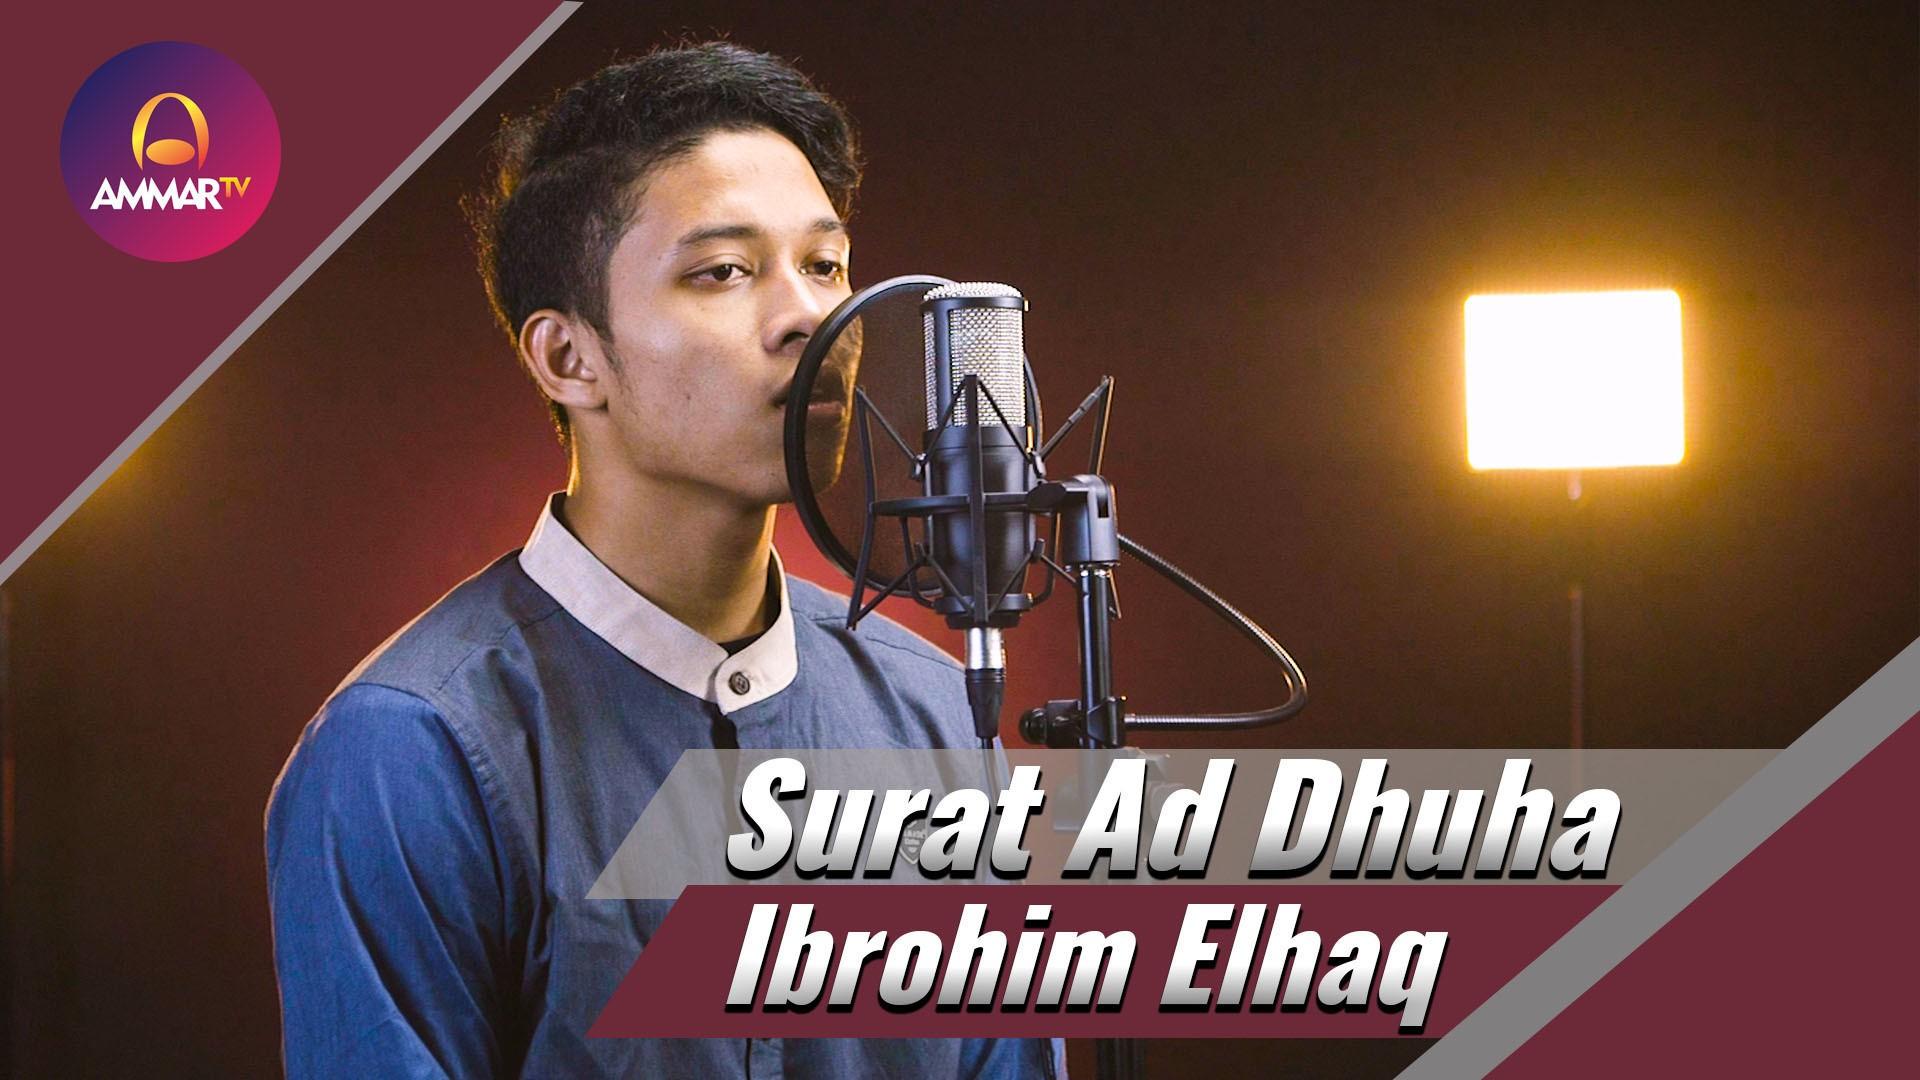 Lantunan Al Quran Oleh Ibrohim Elhaq Surat Ad Dhuha